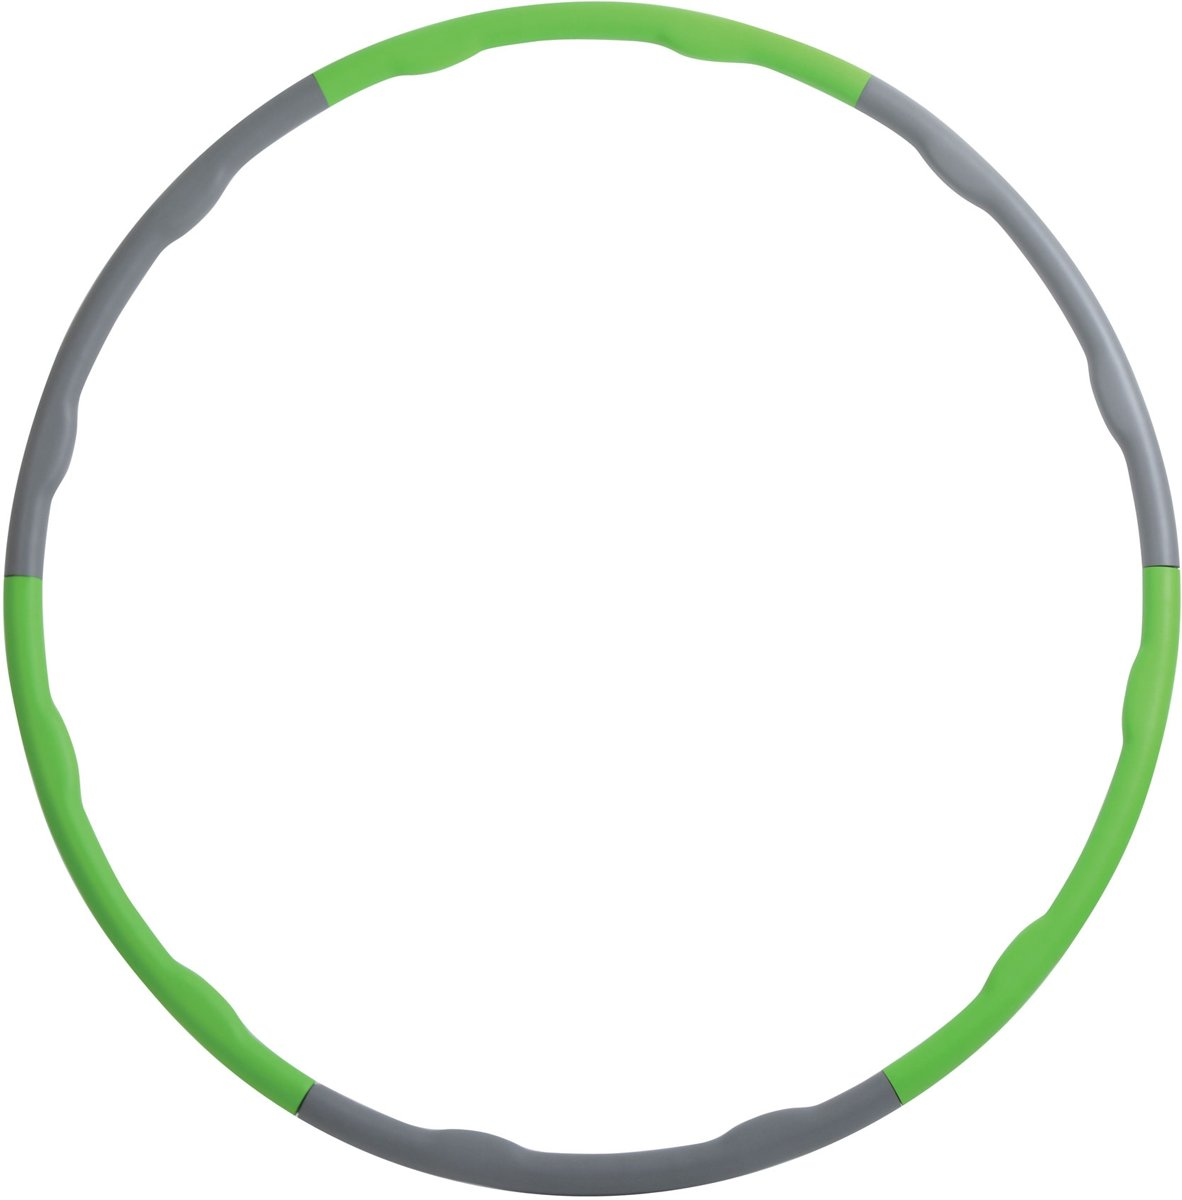 Schildkrot Fitness - Fitness Hoelahoep - 1.2 kg - Ø 100 cm - Groen/Grijs kopen